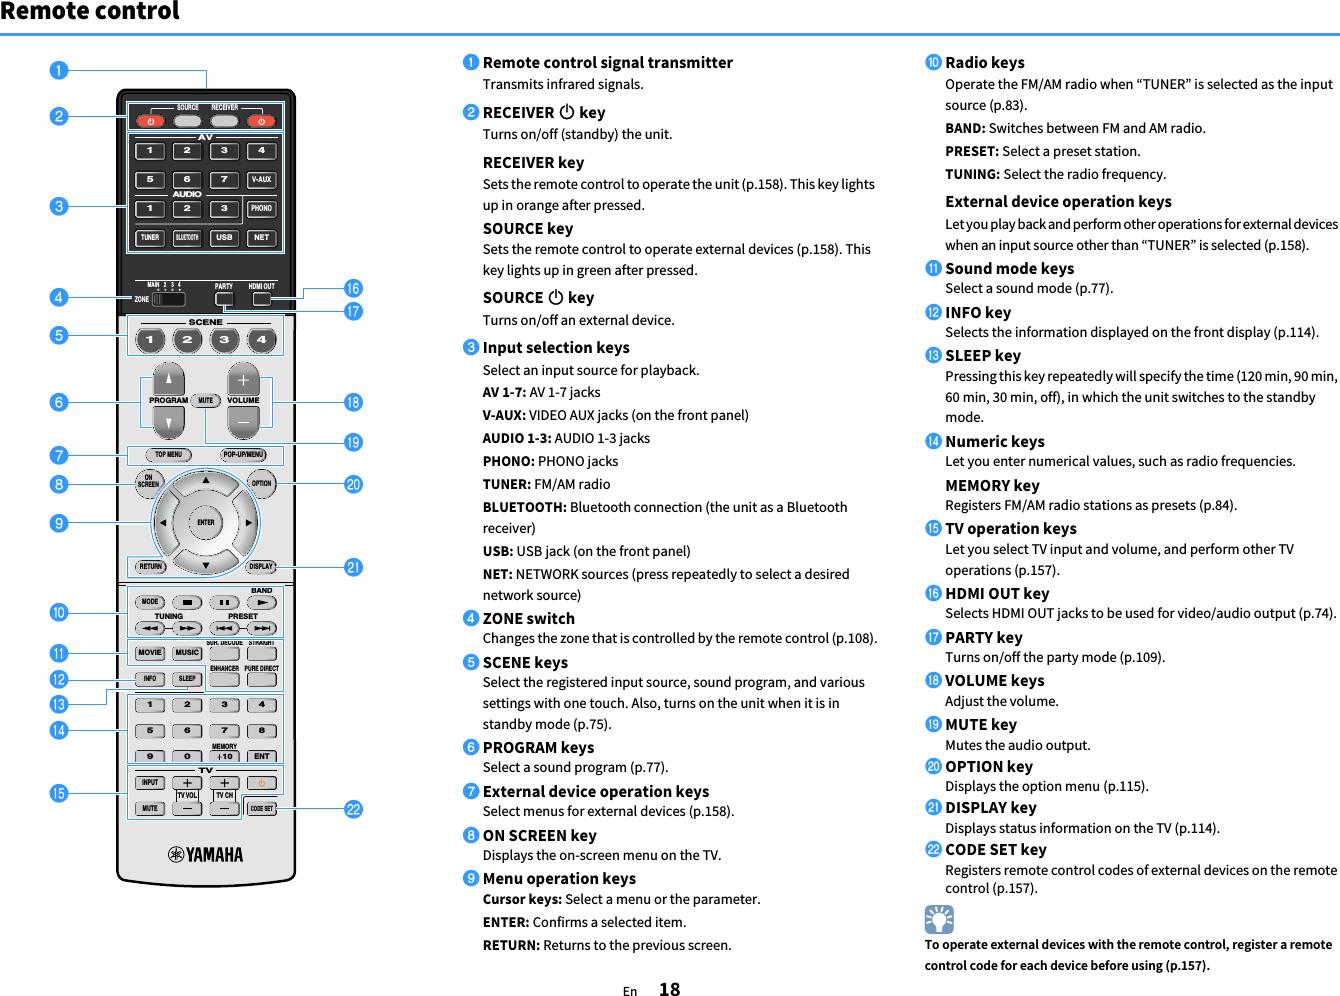 Yamaha RX A3060/RX A2060 Owner's Manual YH790B0 EN1 A3060